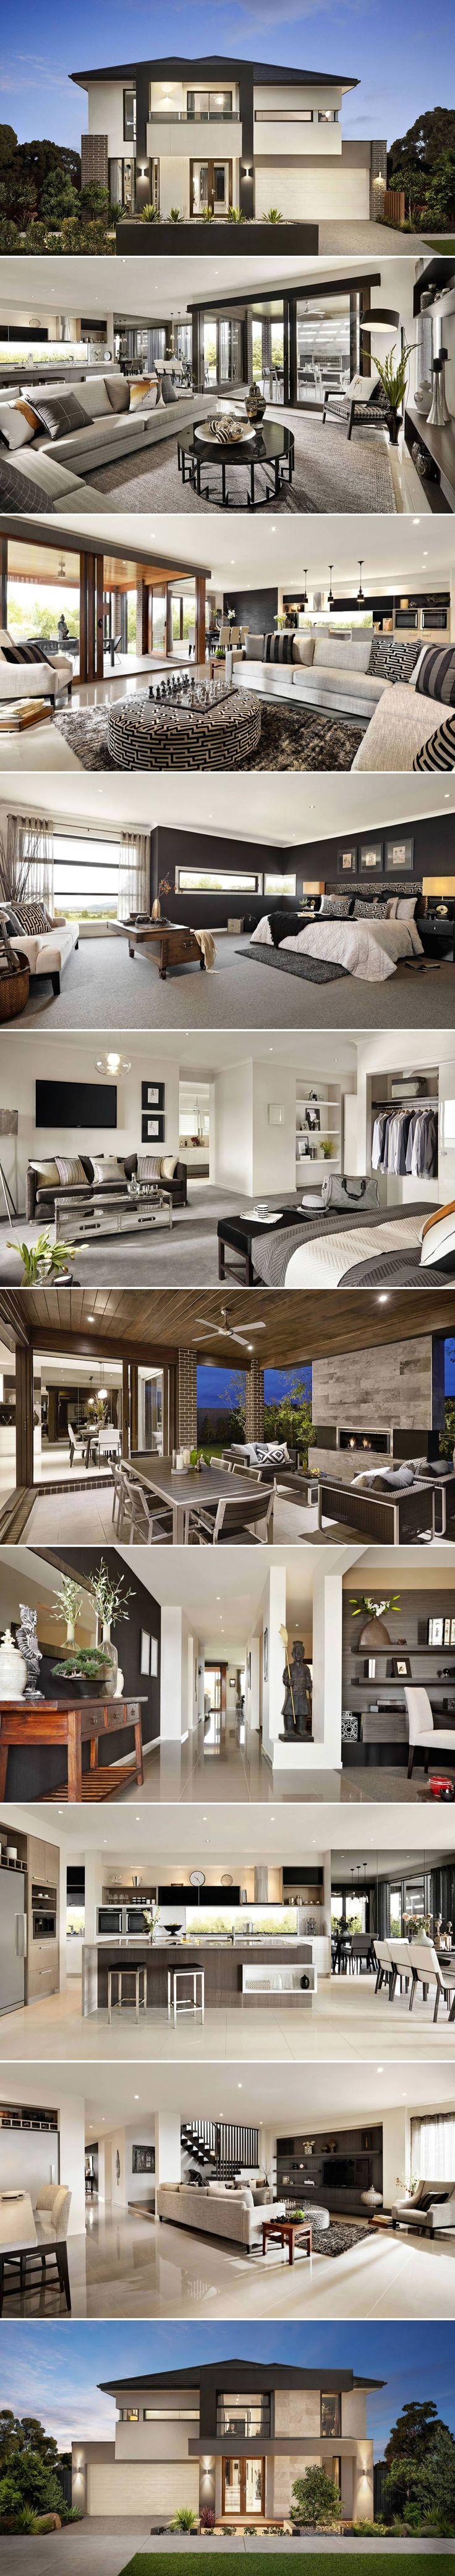 Latest Interior Design Ideas Best European Style Homes Revealed The Best Of Inerior Design In